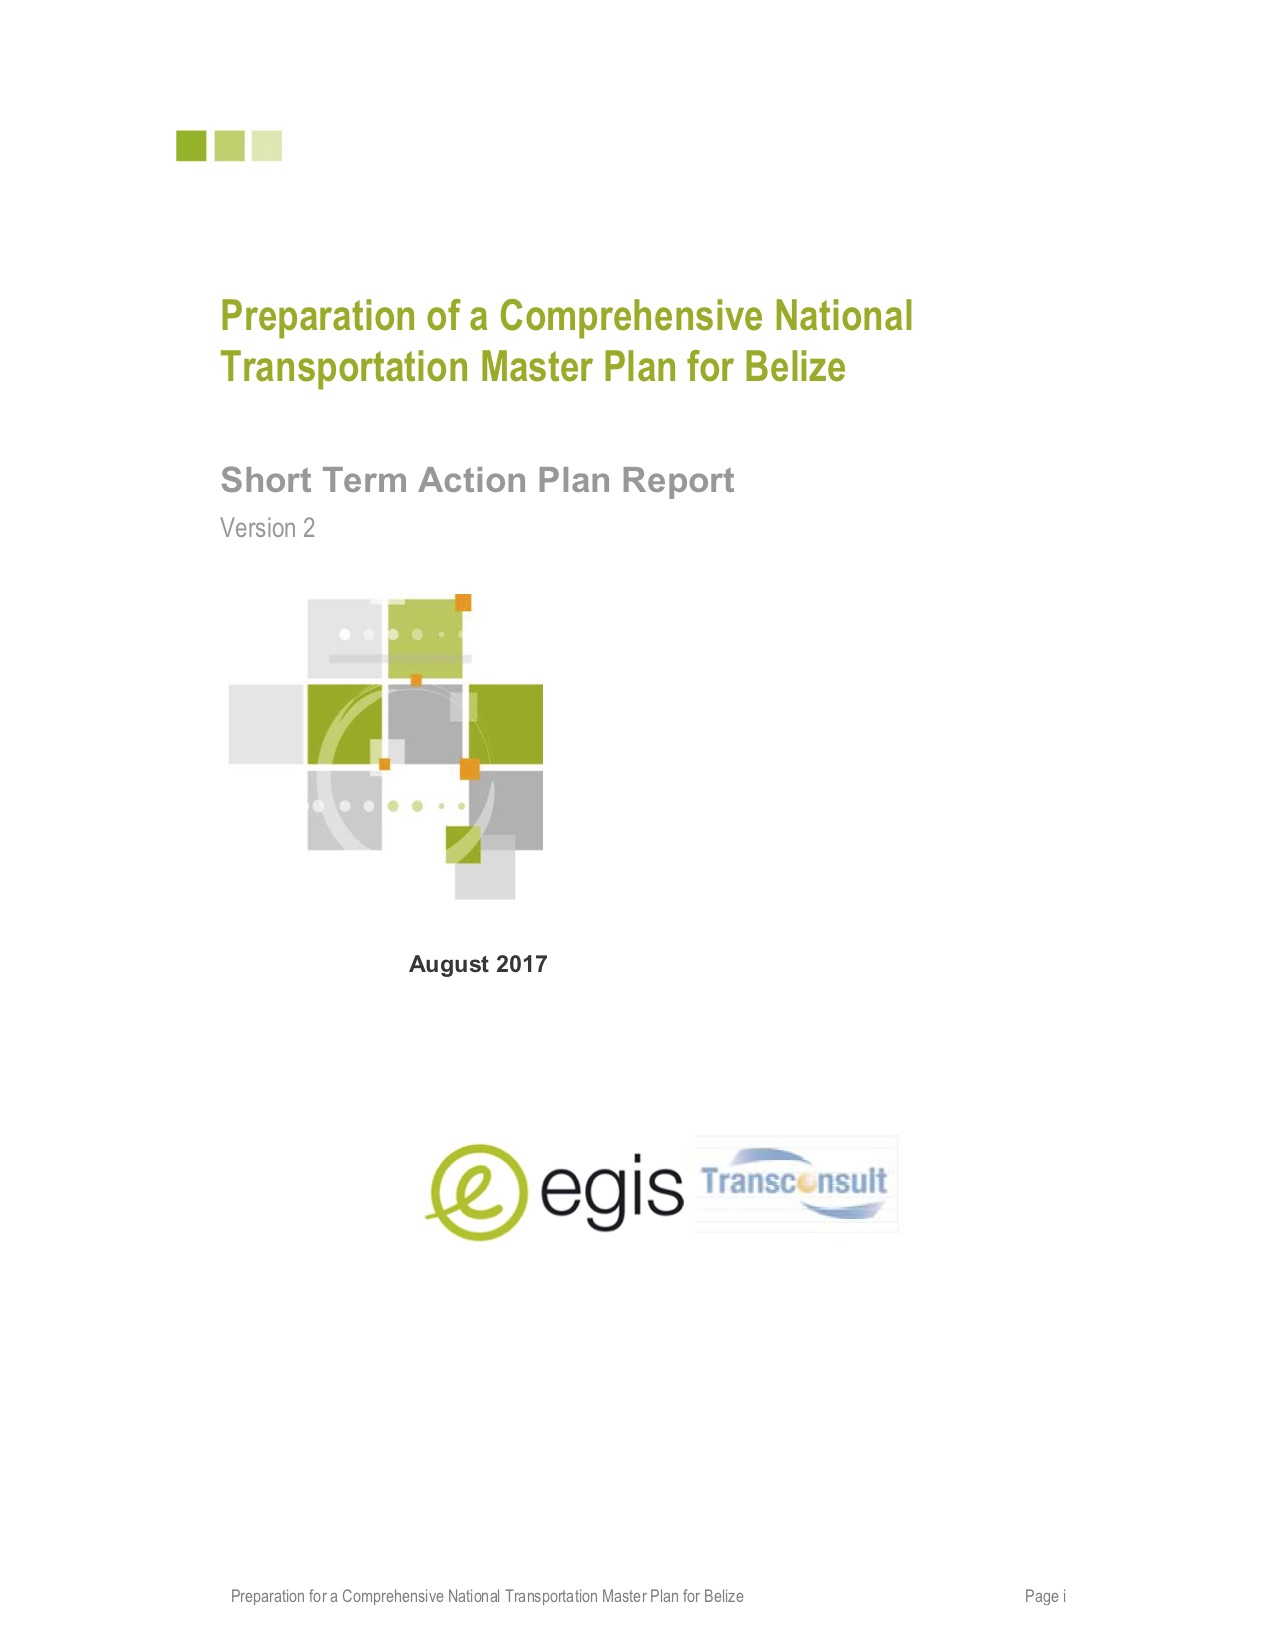 Comprehensive National Transportation Master Plan (CNTMP)